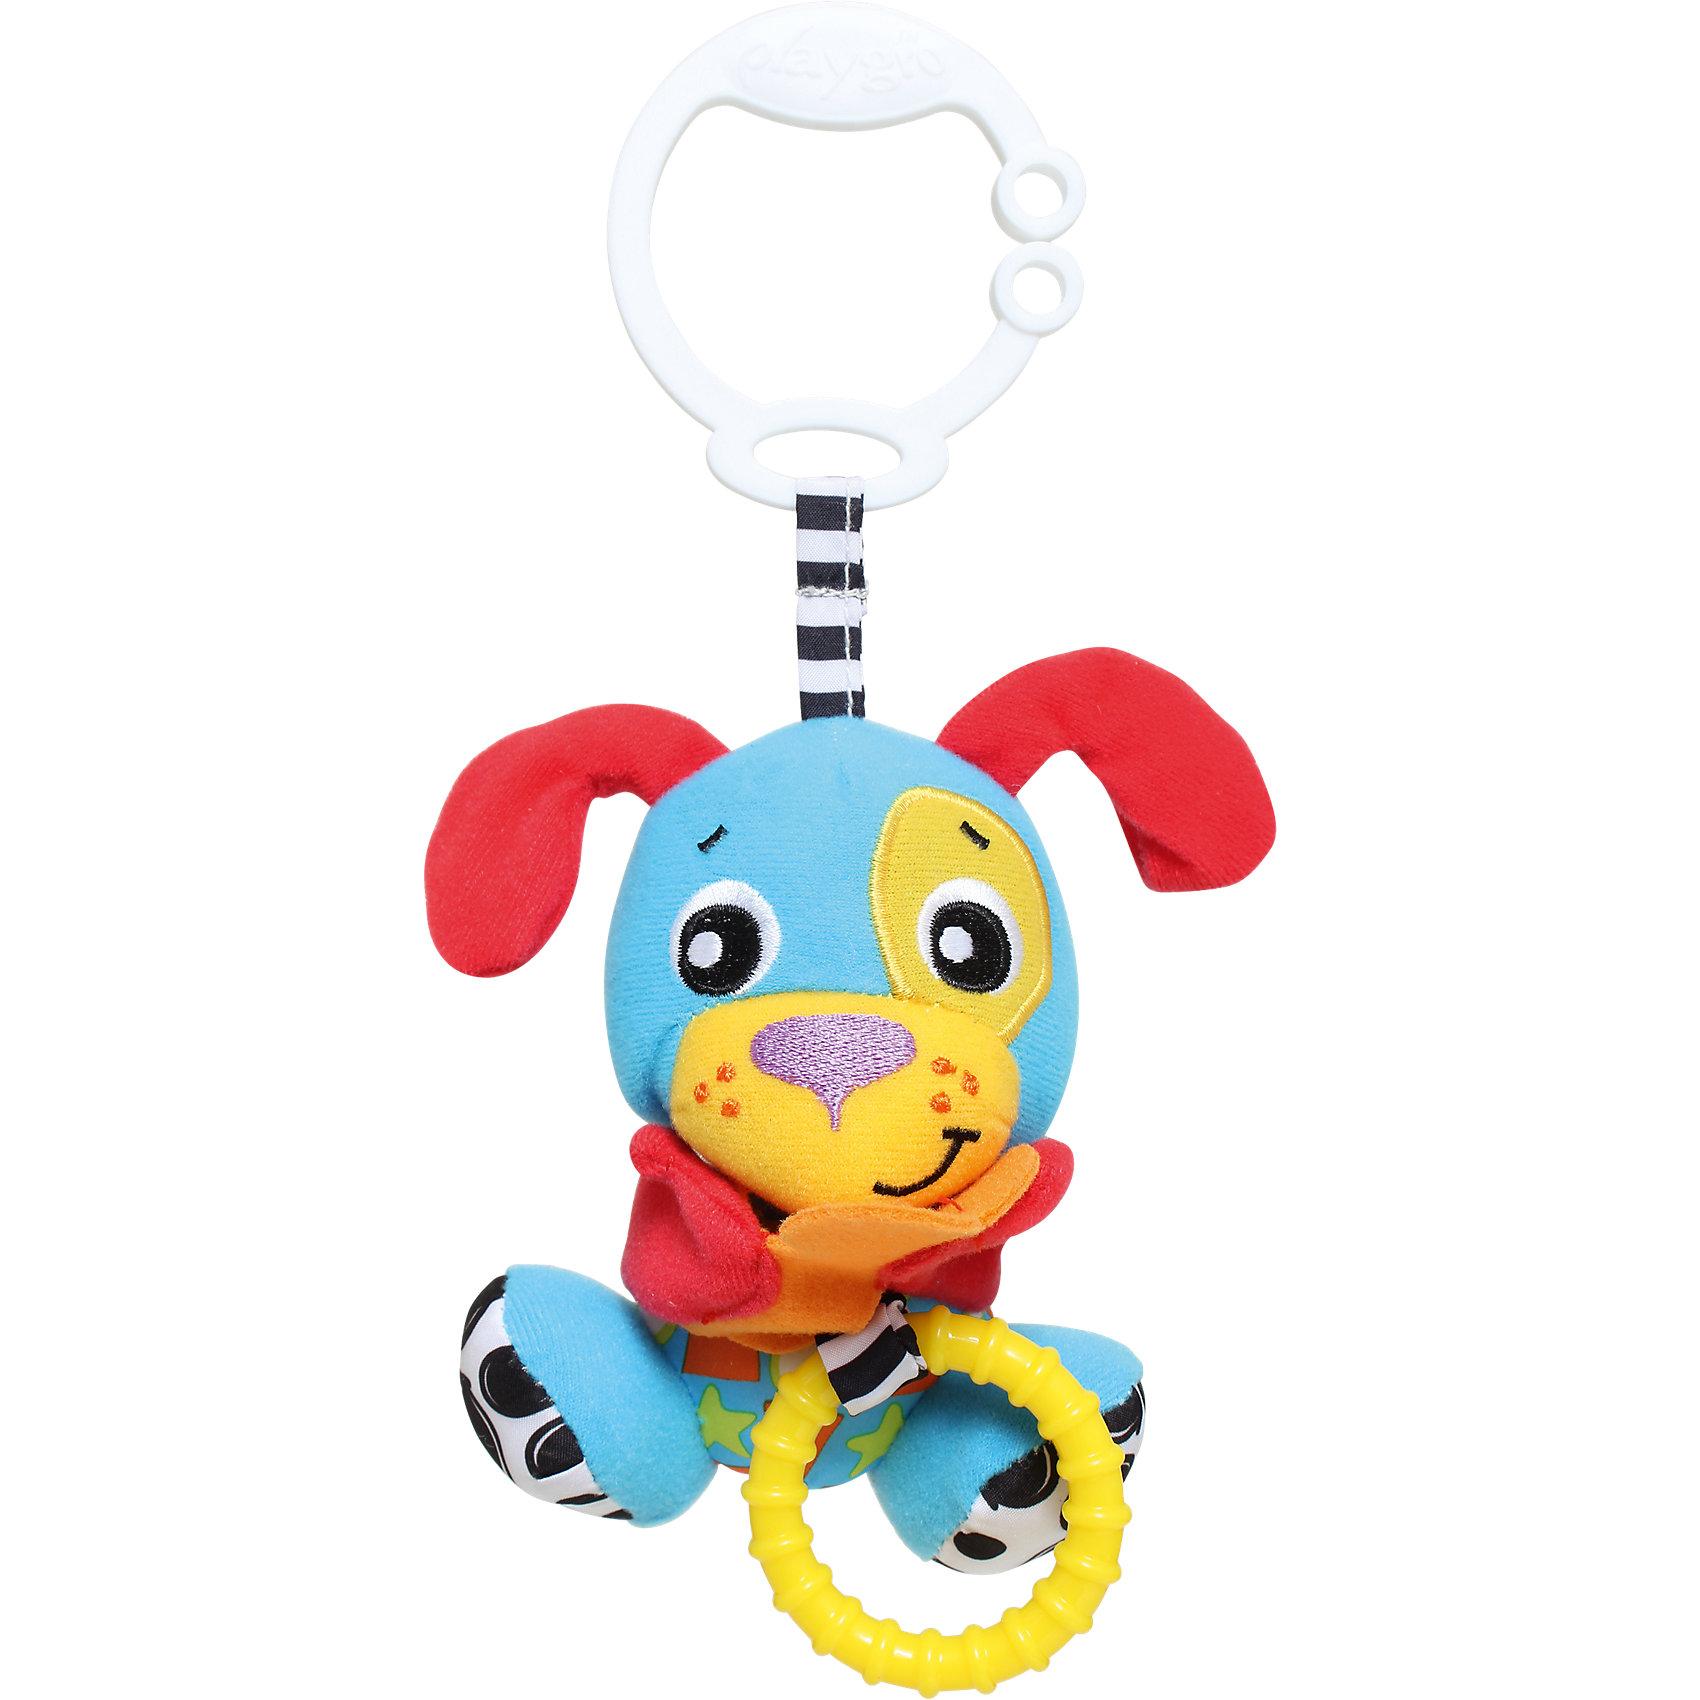 Playgro Игрушка-подвеска Щенок, Playgro playgro мягкая игрушка щенок